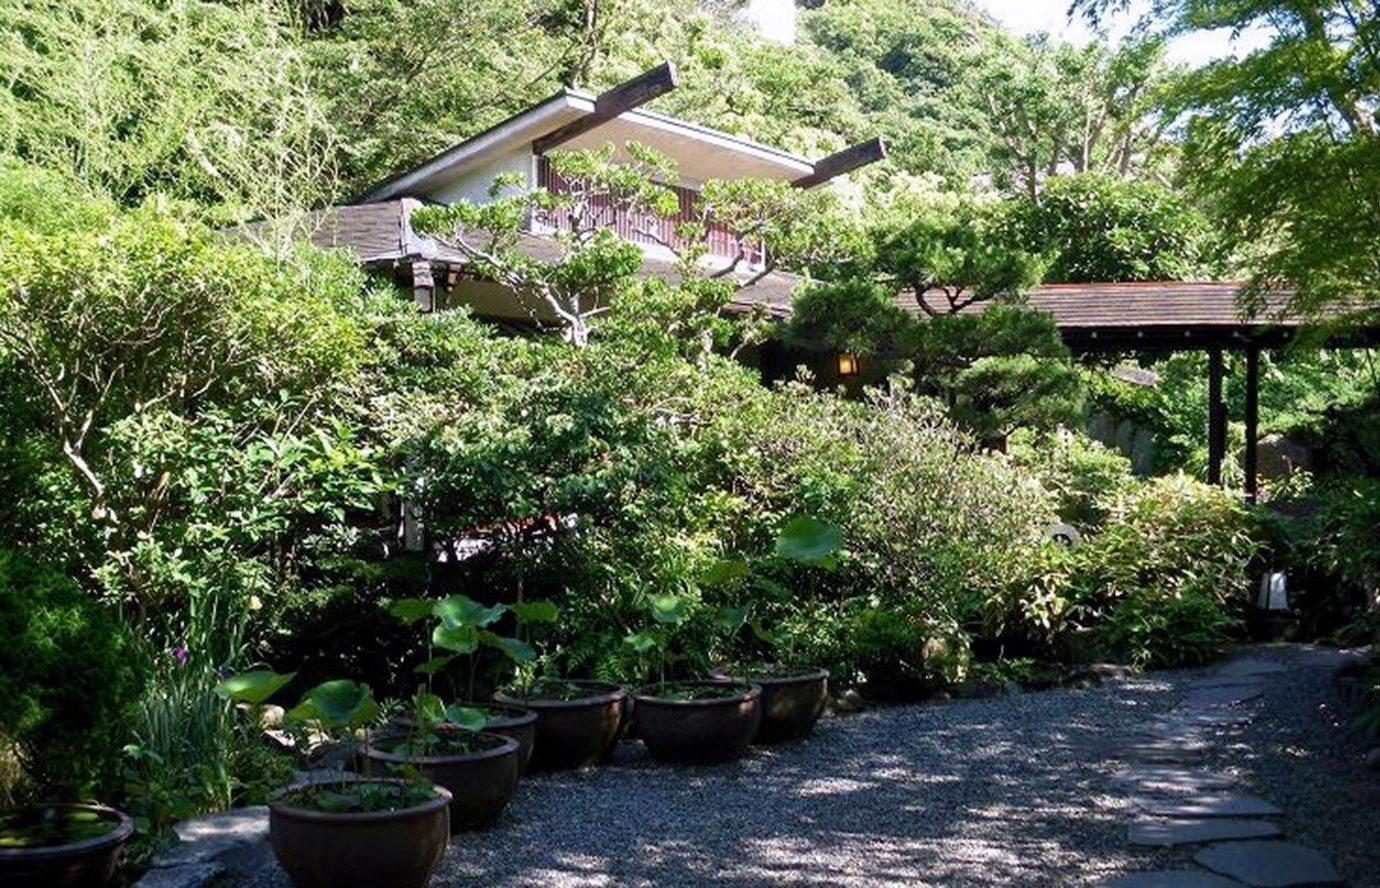 Trip Ideas tree outdoor property building botany Garden plant flower cottage yard estate house shrub backyard botanical garden bushes surrounded